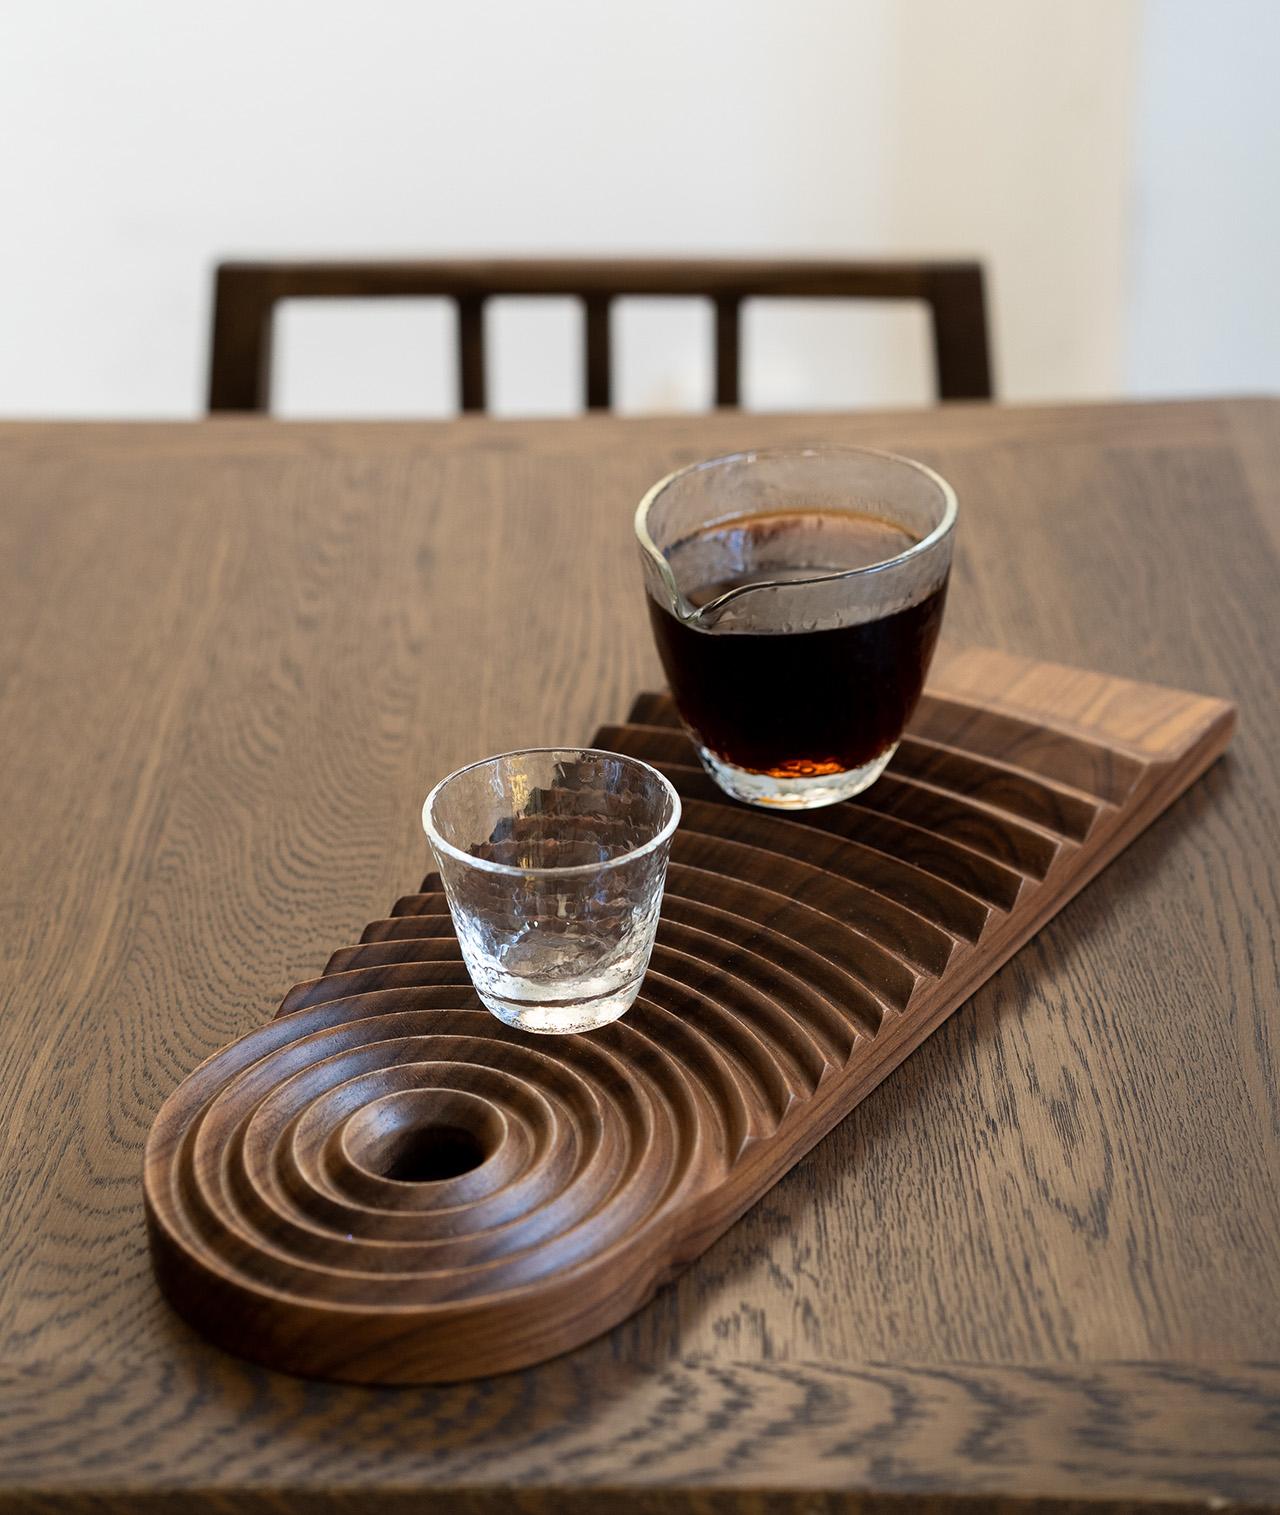 A uniquely designed serving tray.